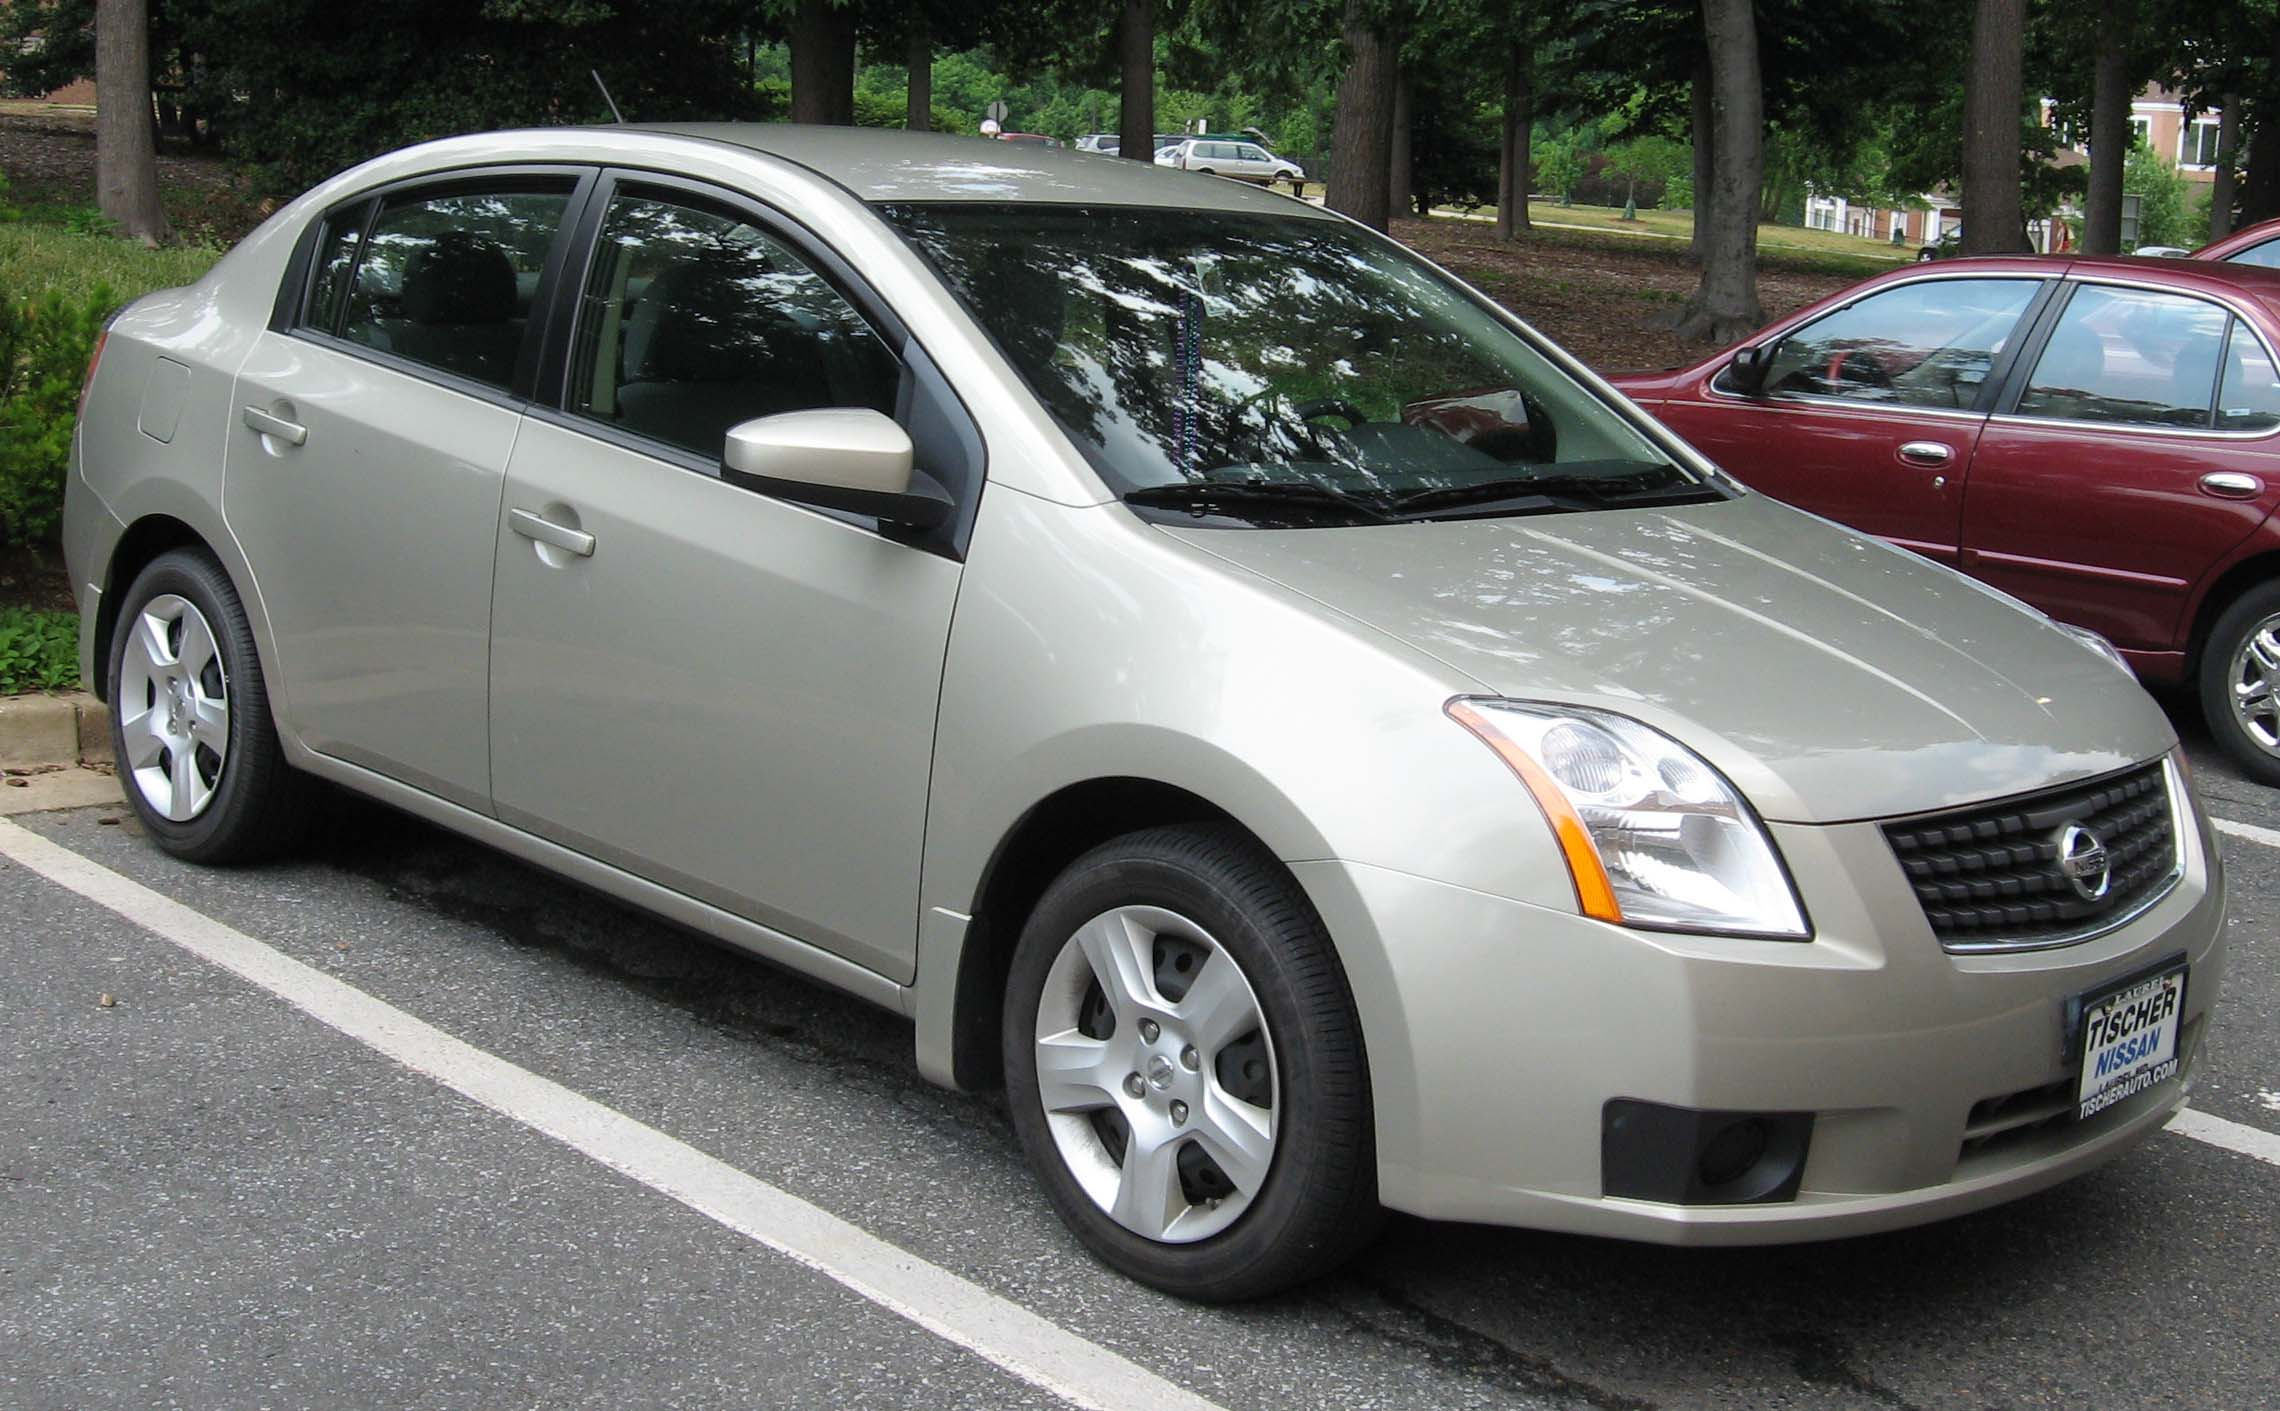 File:2007 Nissan Sentra.jpg - Wikimedia Commons